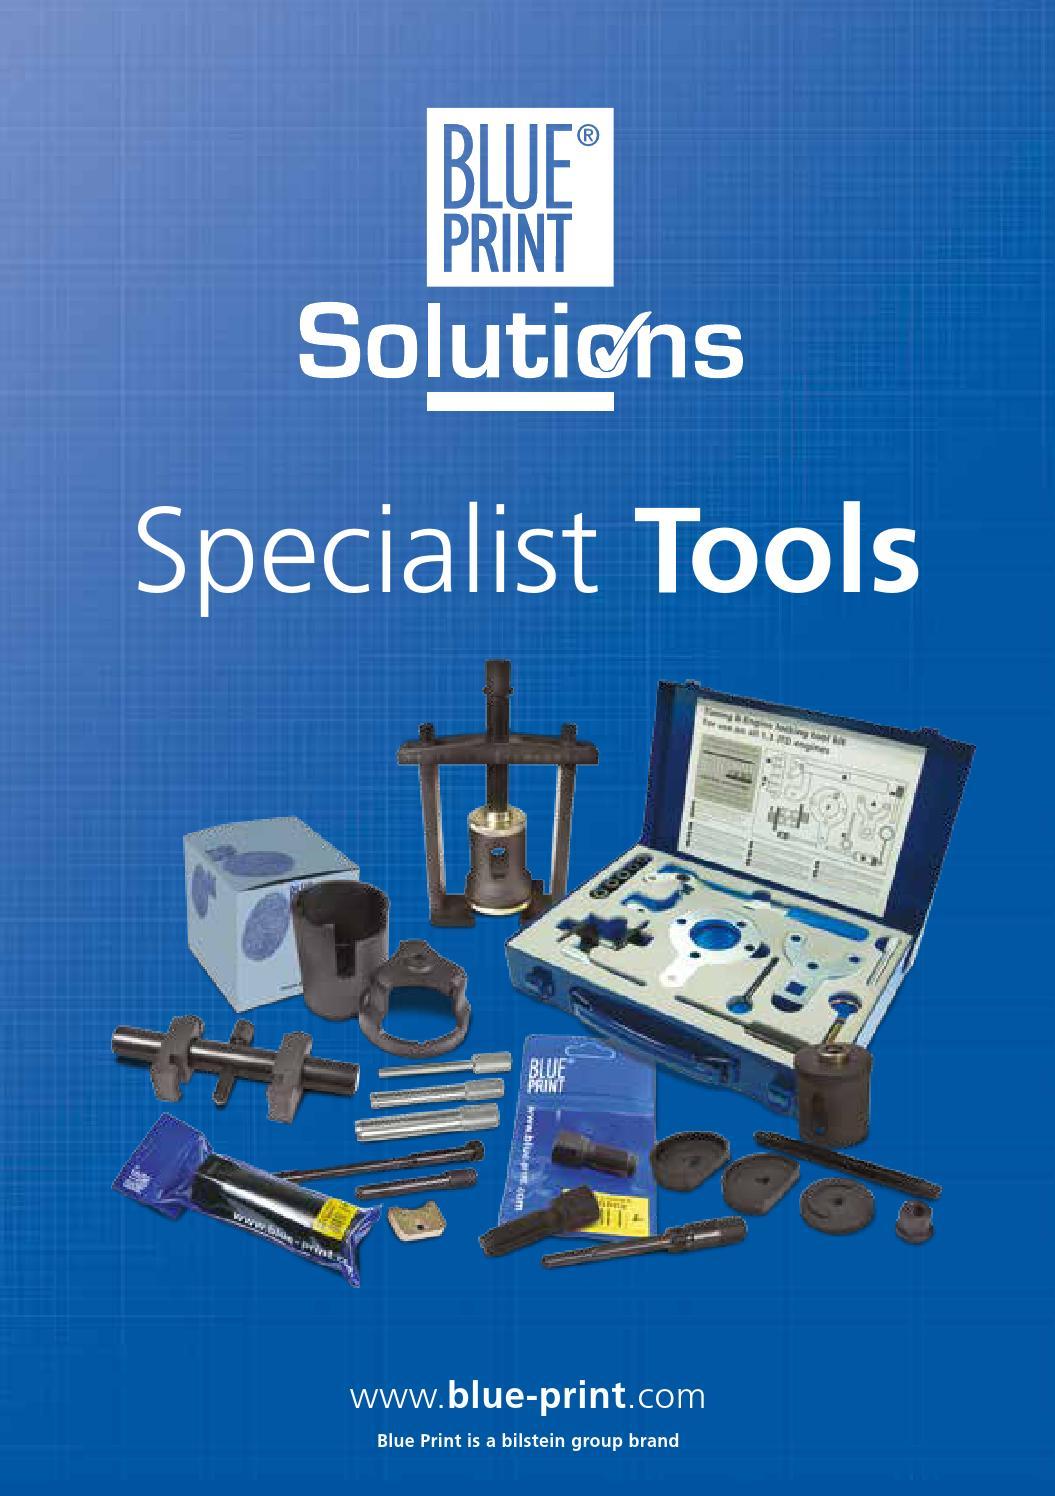 Blue Print Tool Range booklet by Blue Print - issuu